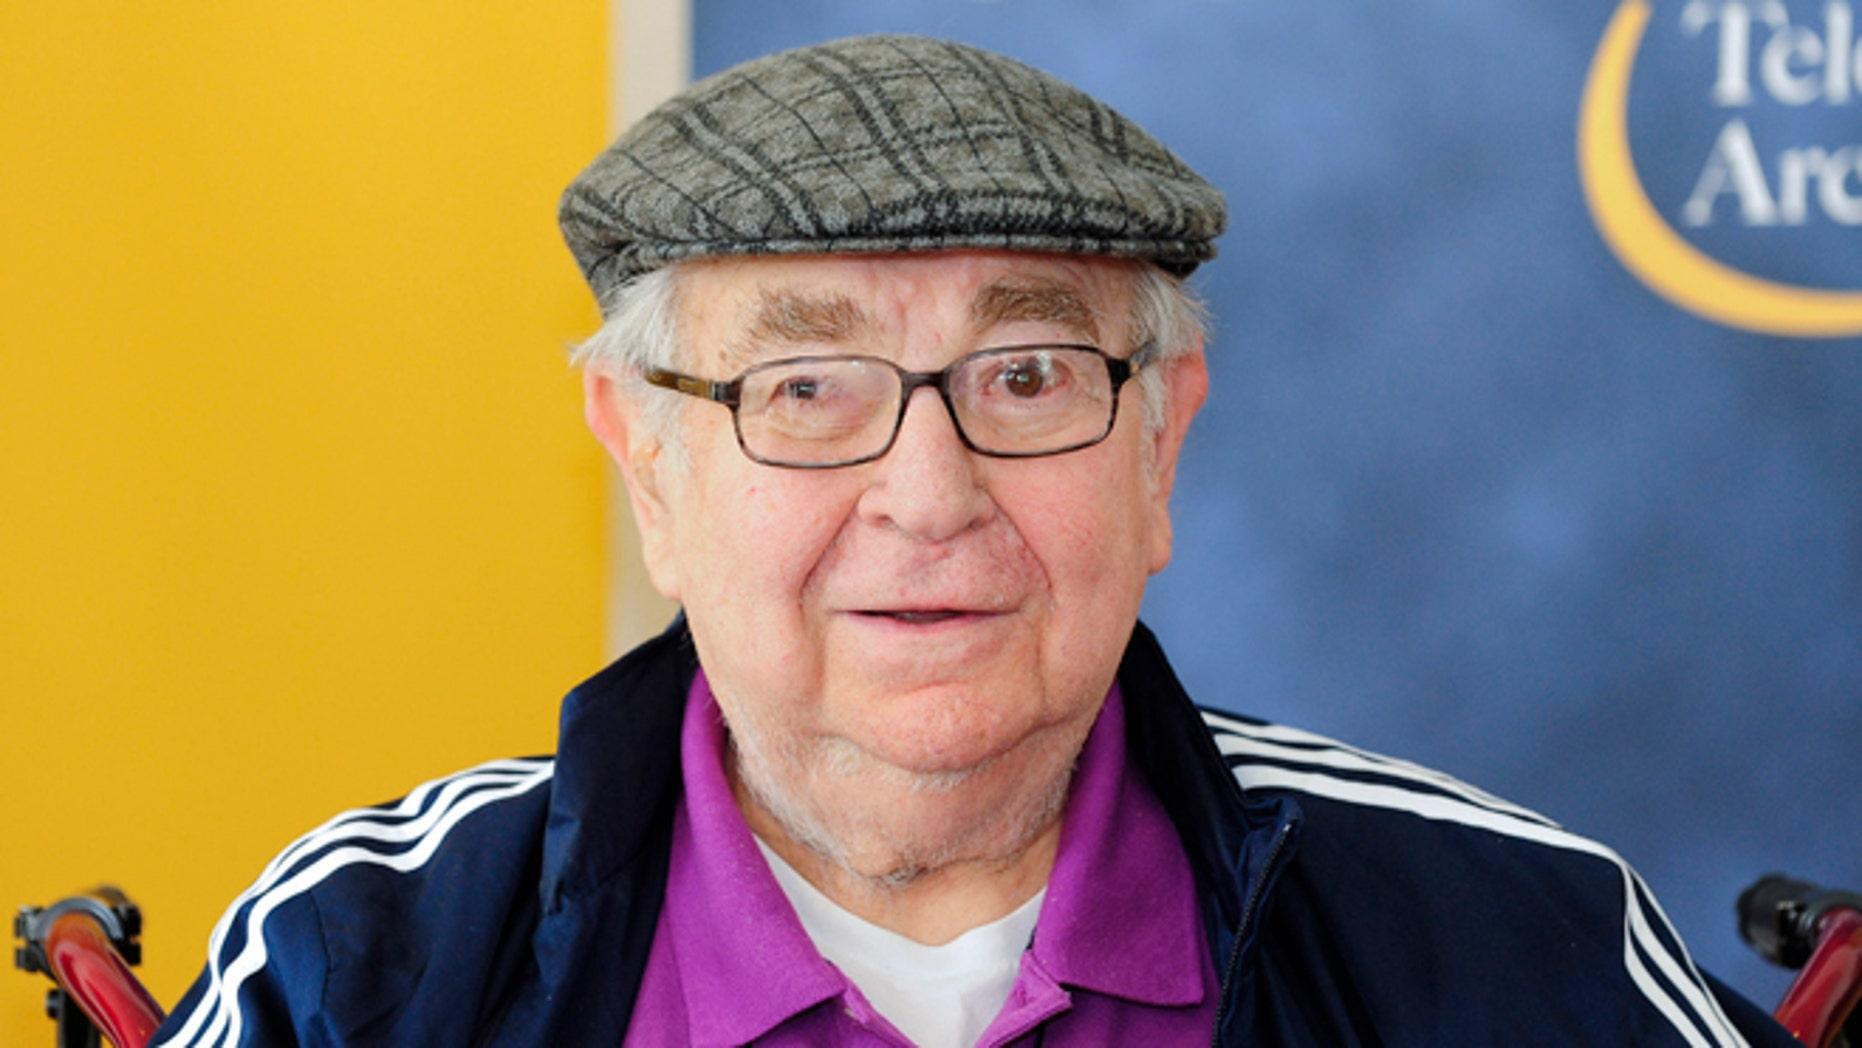 Veteran sitcom actor Marvin Kaplan died at age 89.